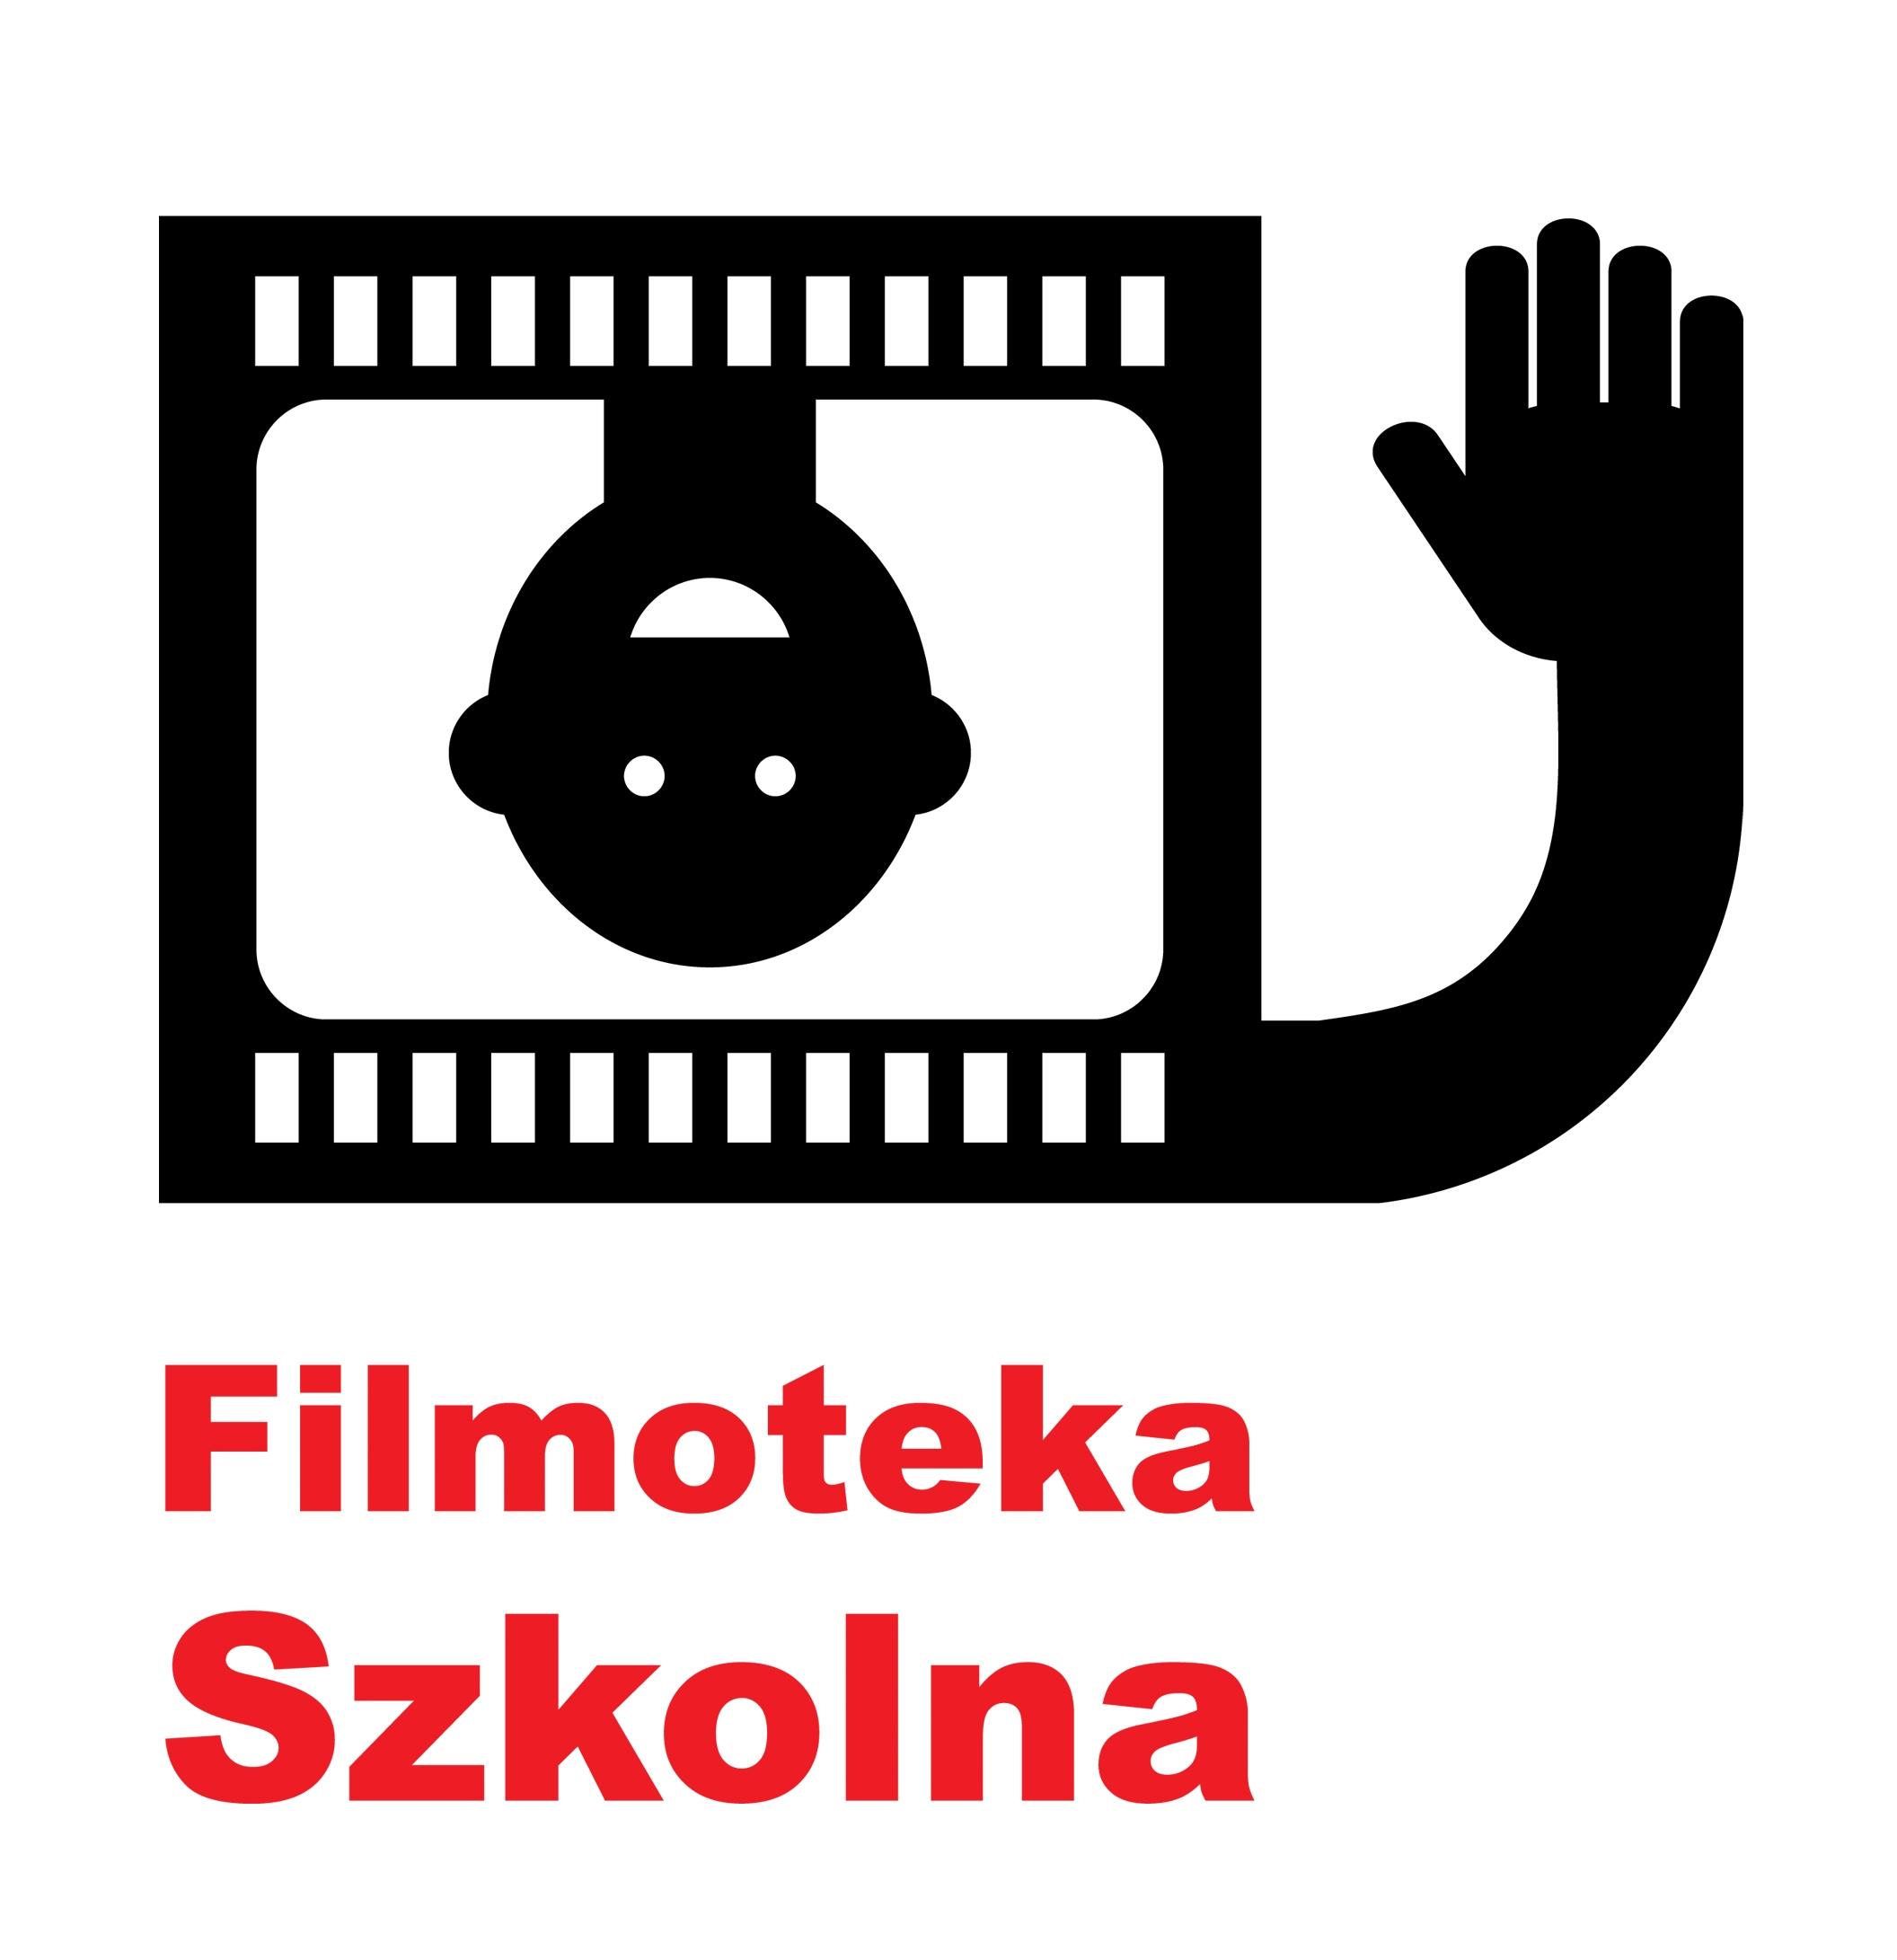 http://g1zakopane.szkolnastrona.pl/container/logo1.jpg